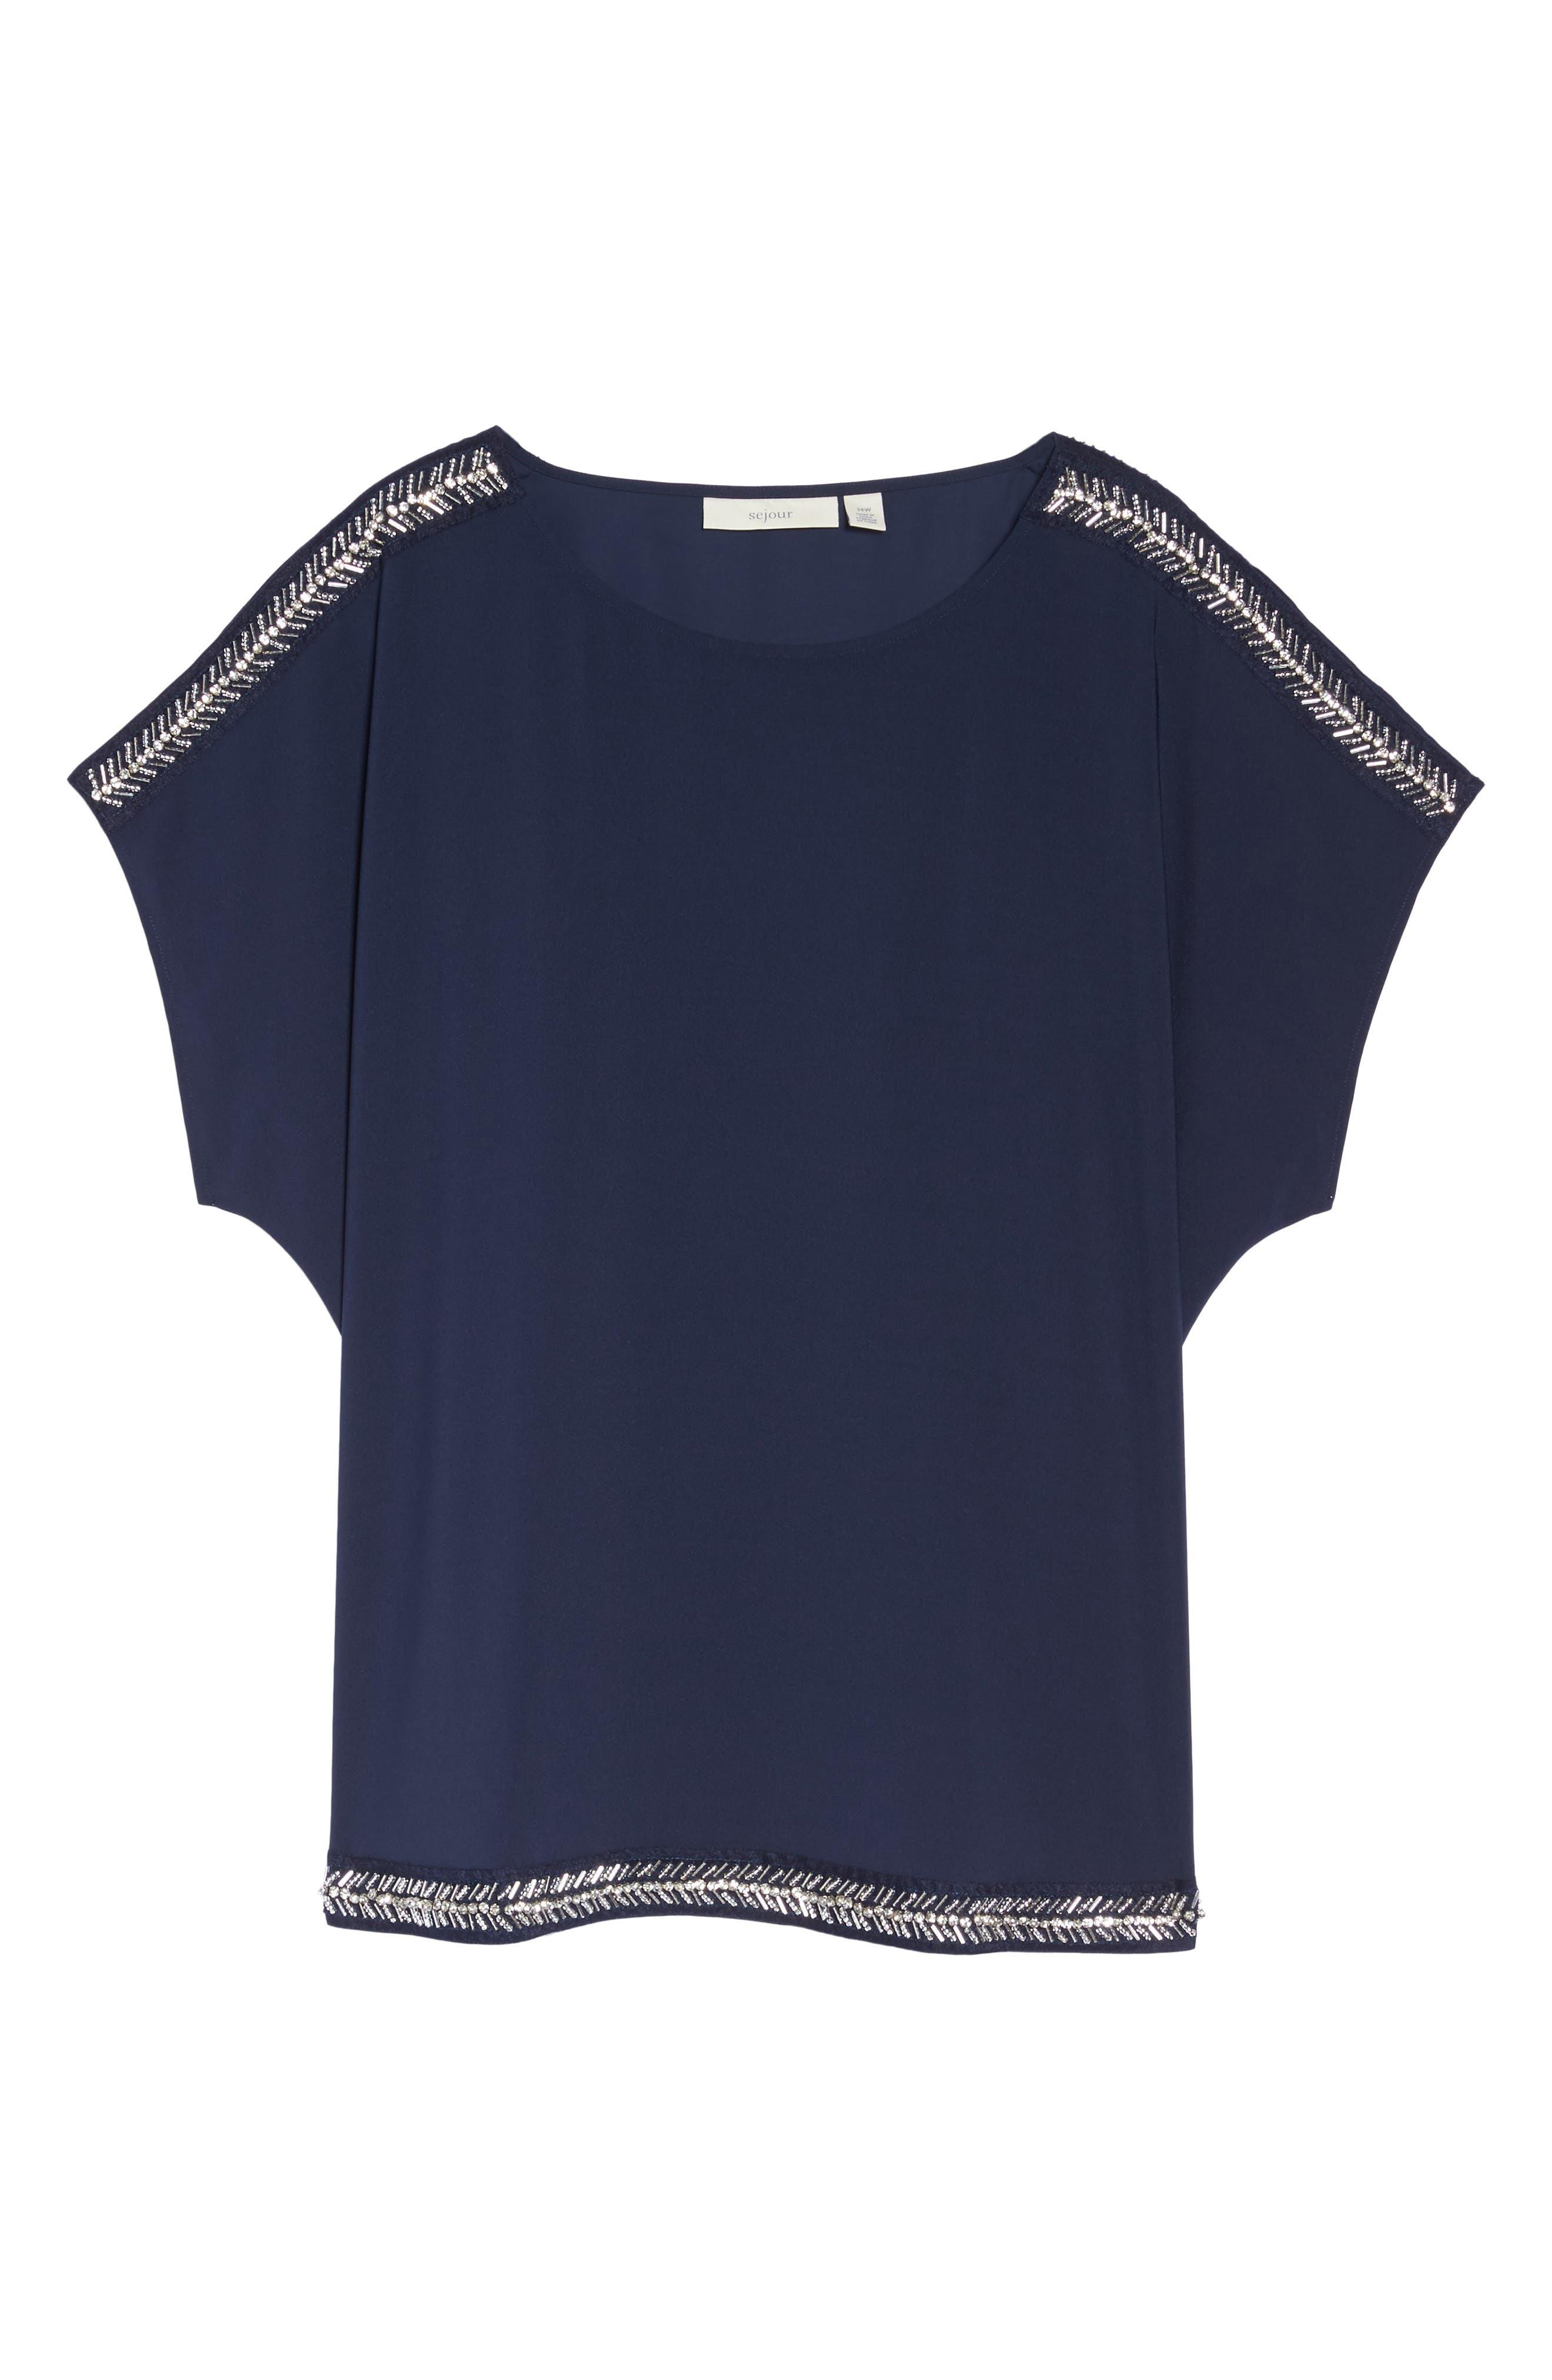 Embellished Slit Sleeve Blouse,                             Alternate thumbnail 6, color,                             Navy Peacoat